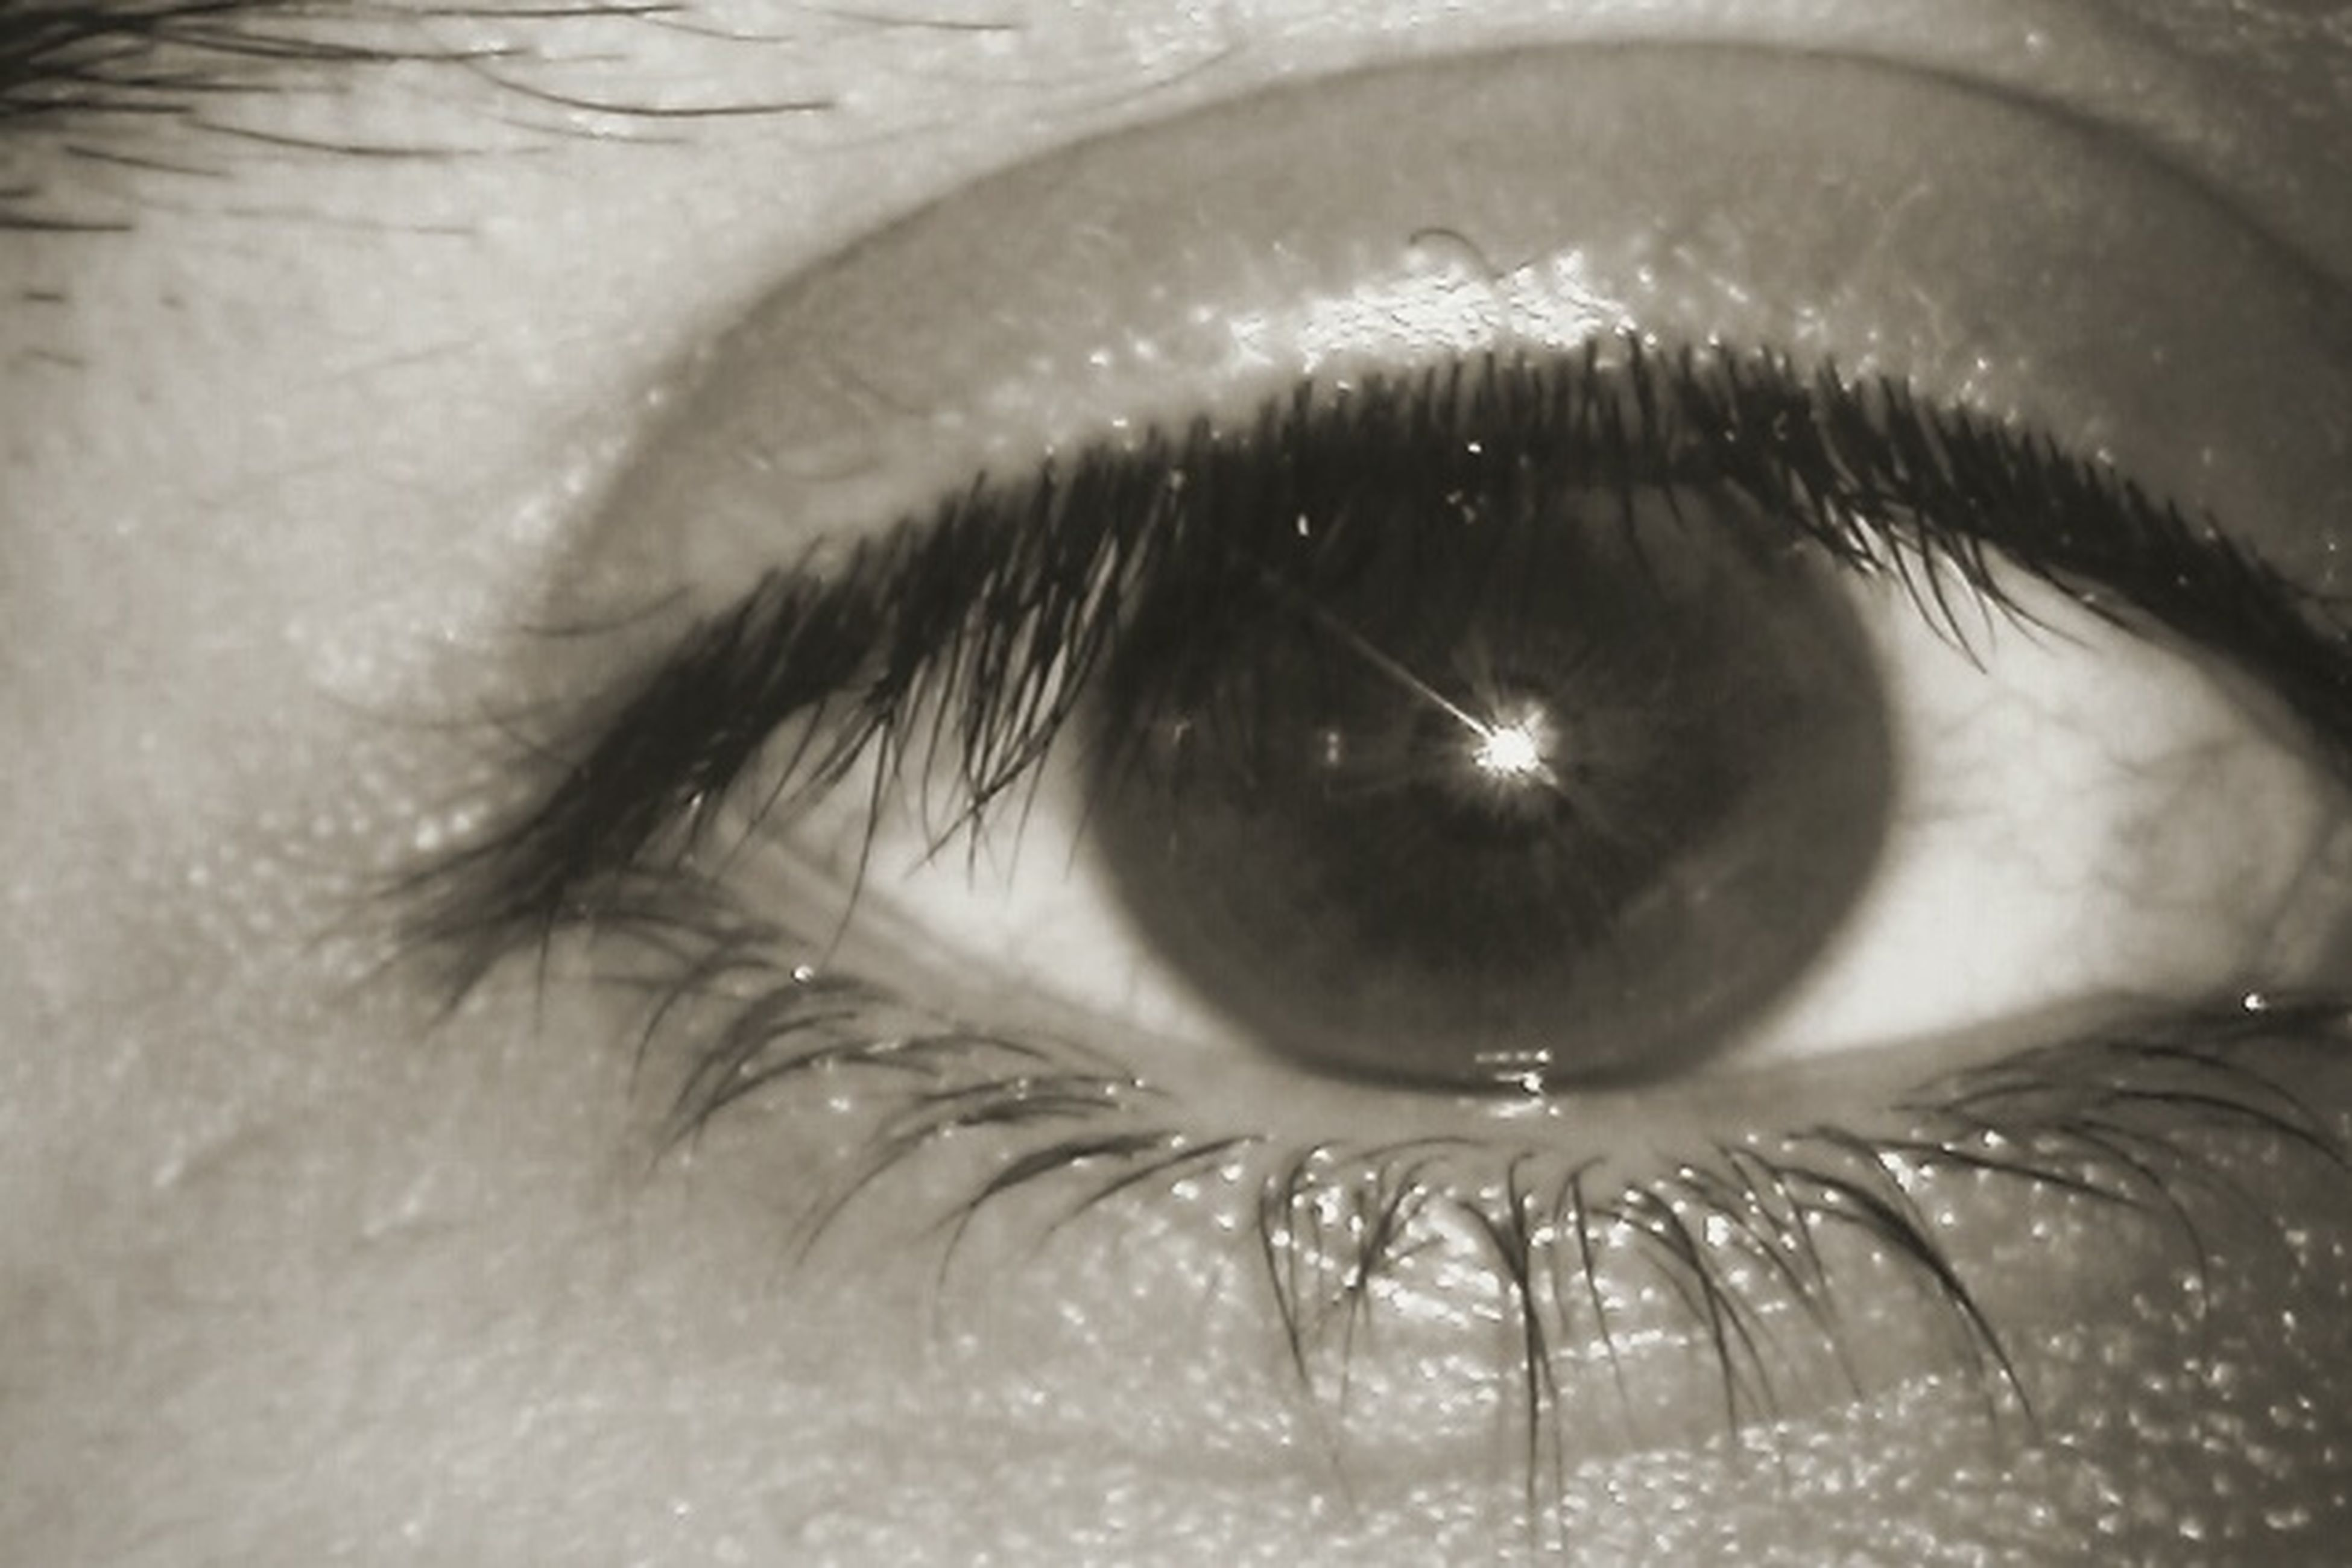 human eye, close-up, part of, eyelash, eyesight, sensory perception, indoors, unrecognizable person, person, reflection, human skin, human face, lifestyles, extreme close-up, cropped, eyeball